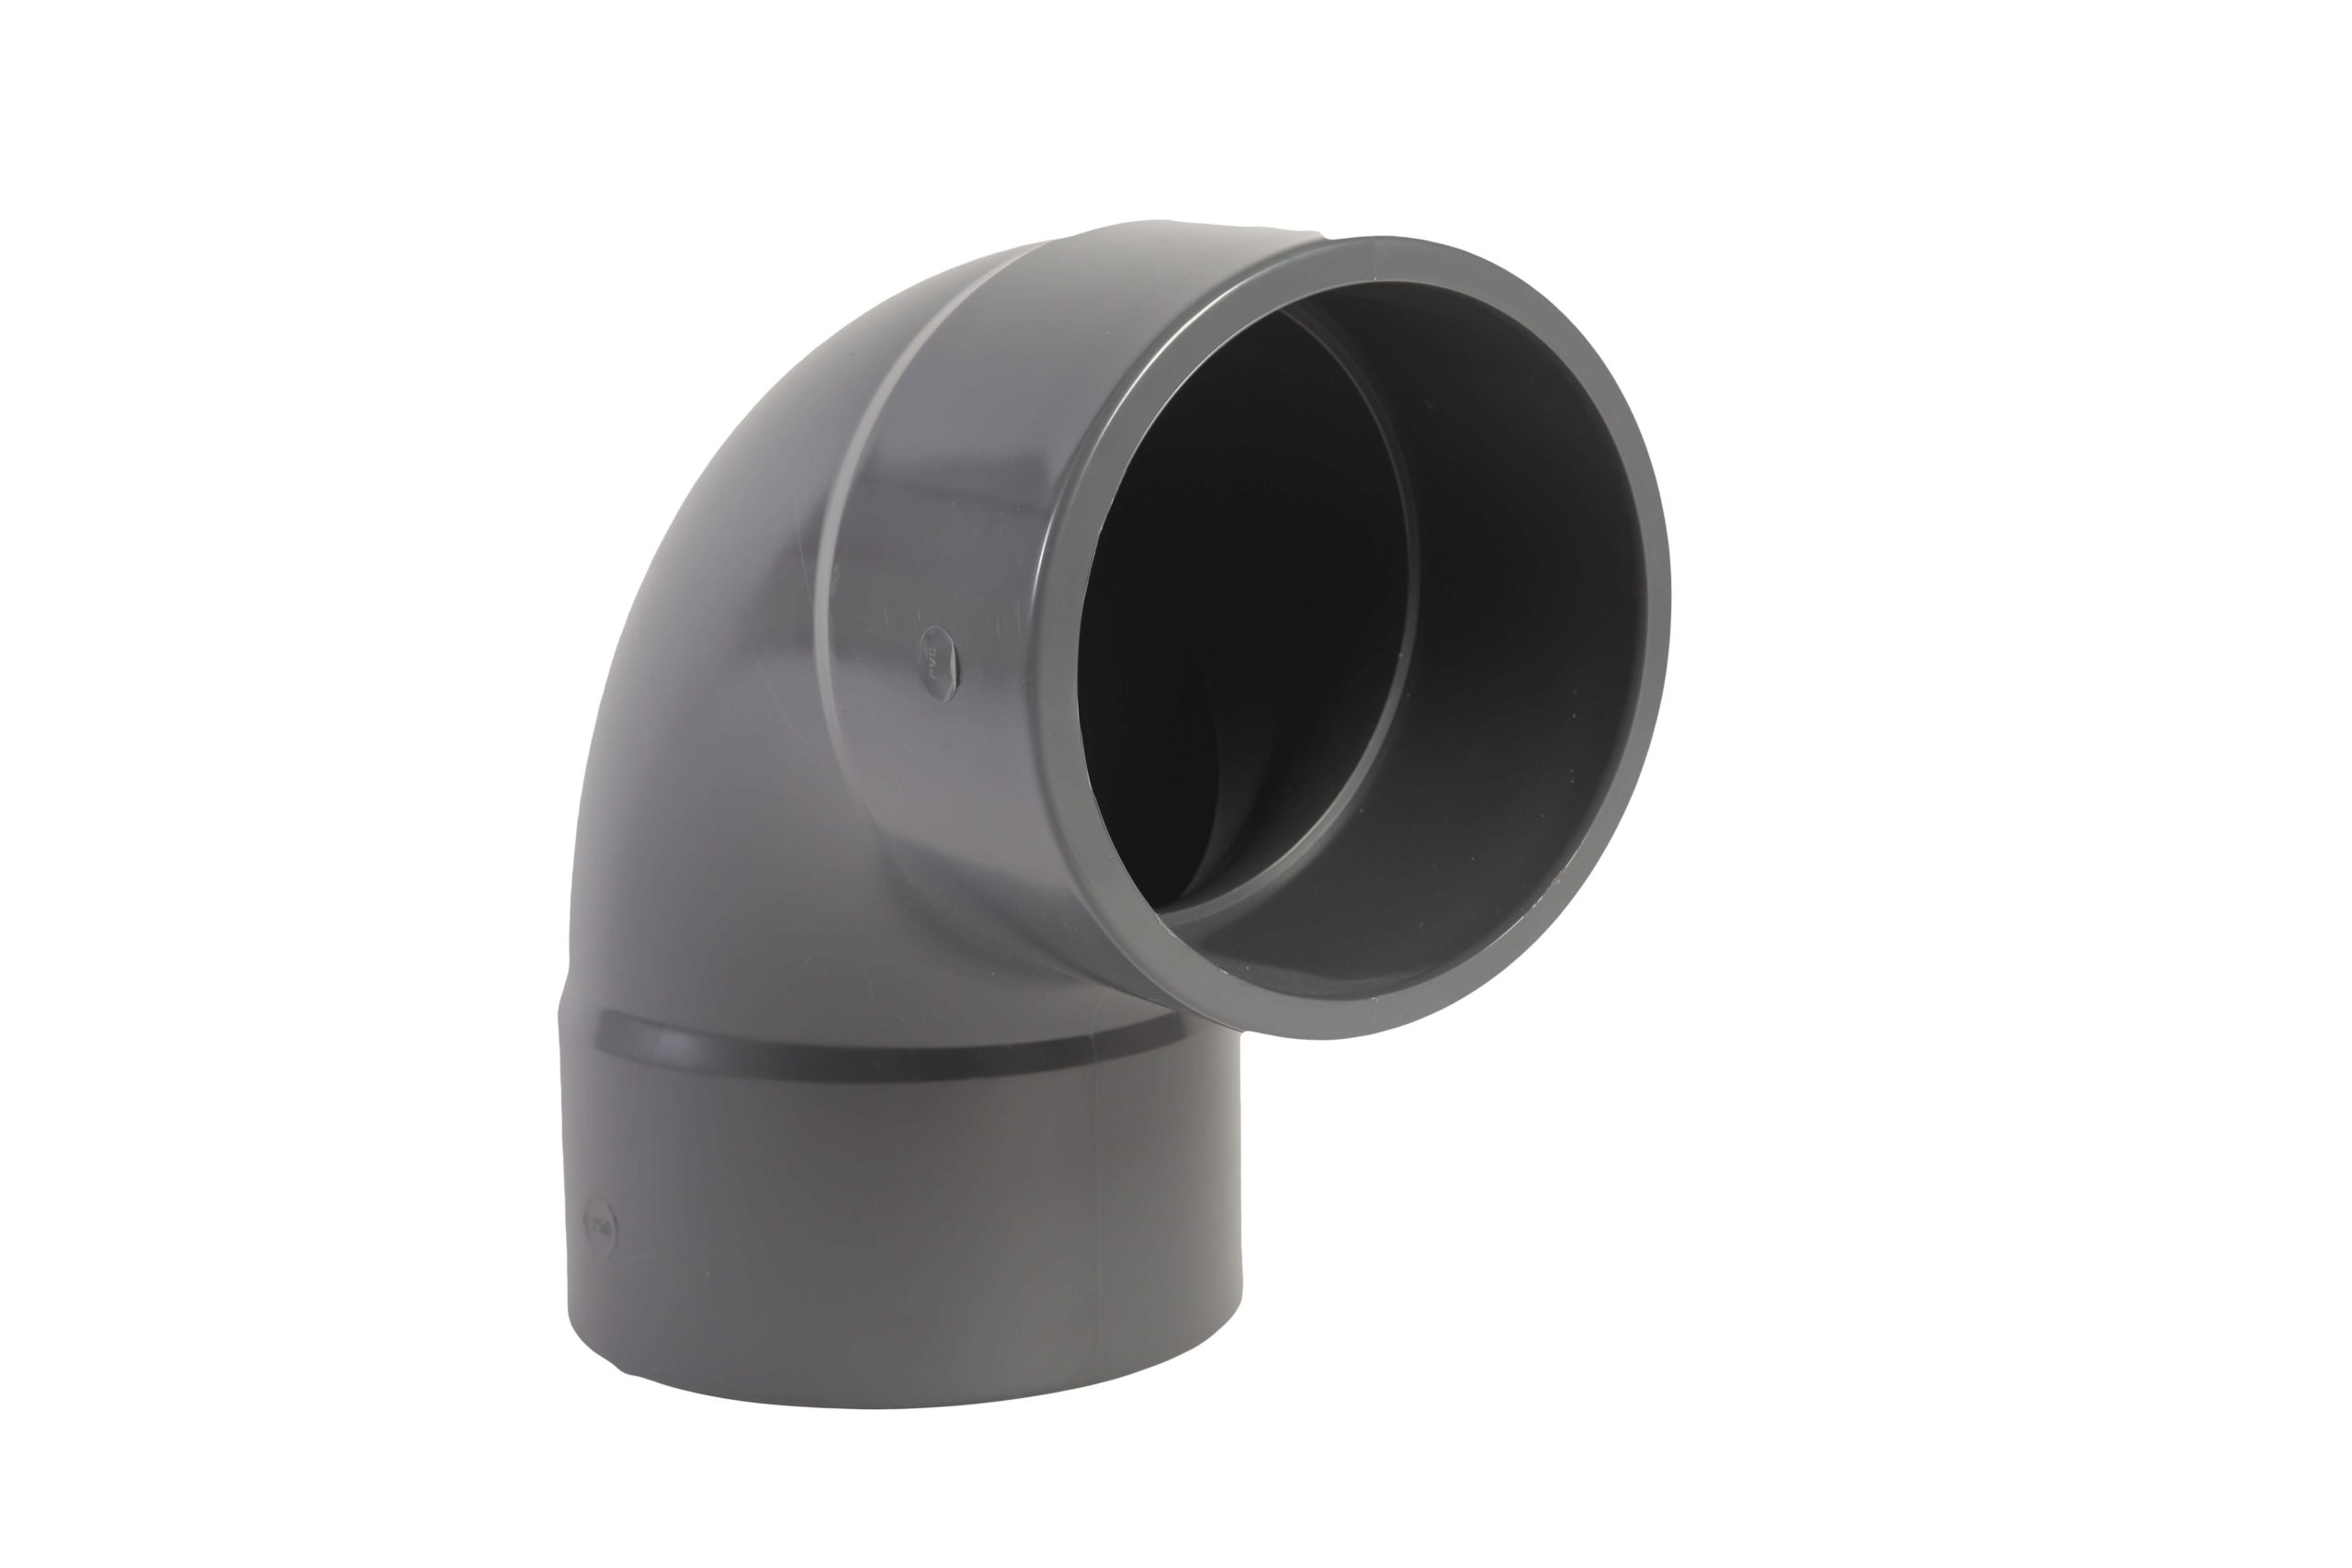 metric plain series for gluing U-PVC fittings - COMER S.p.A.